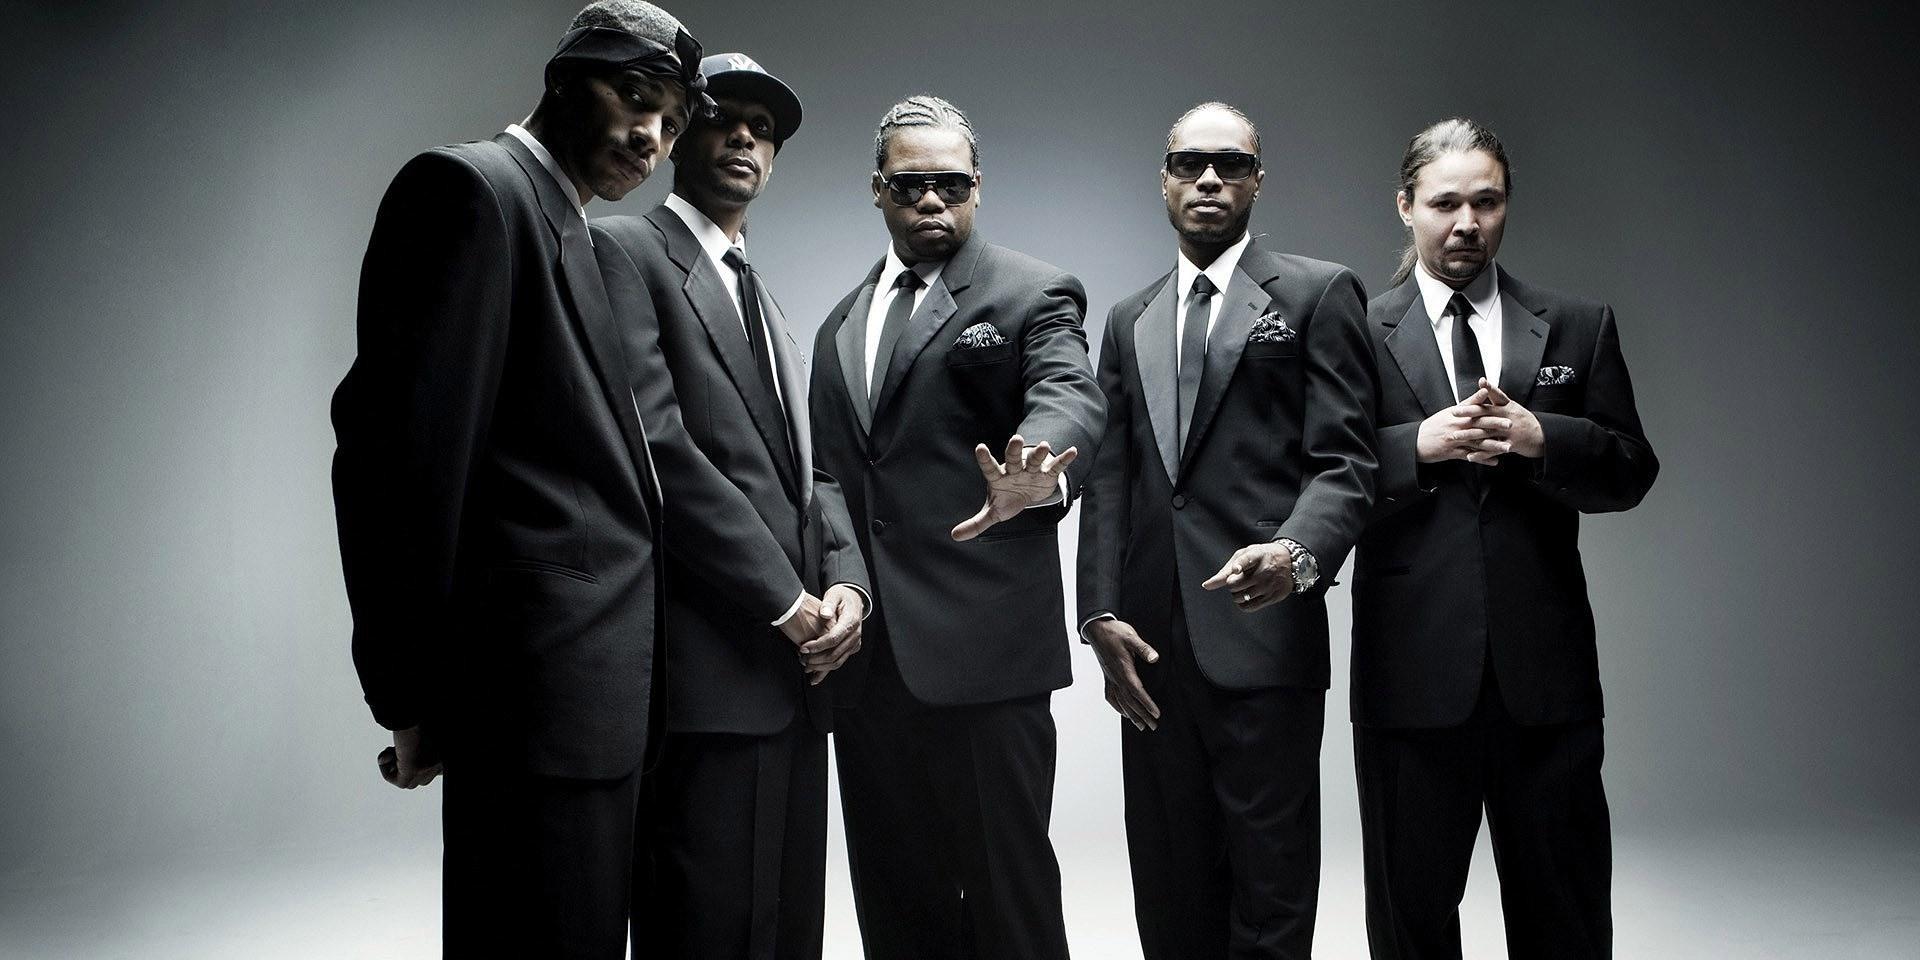 Bone Thugs-N-Harmony are coming to Manila